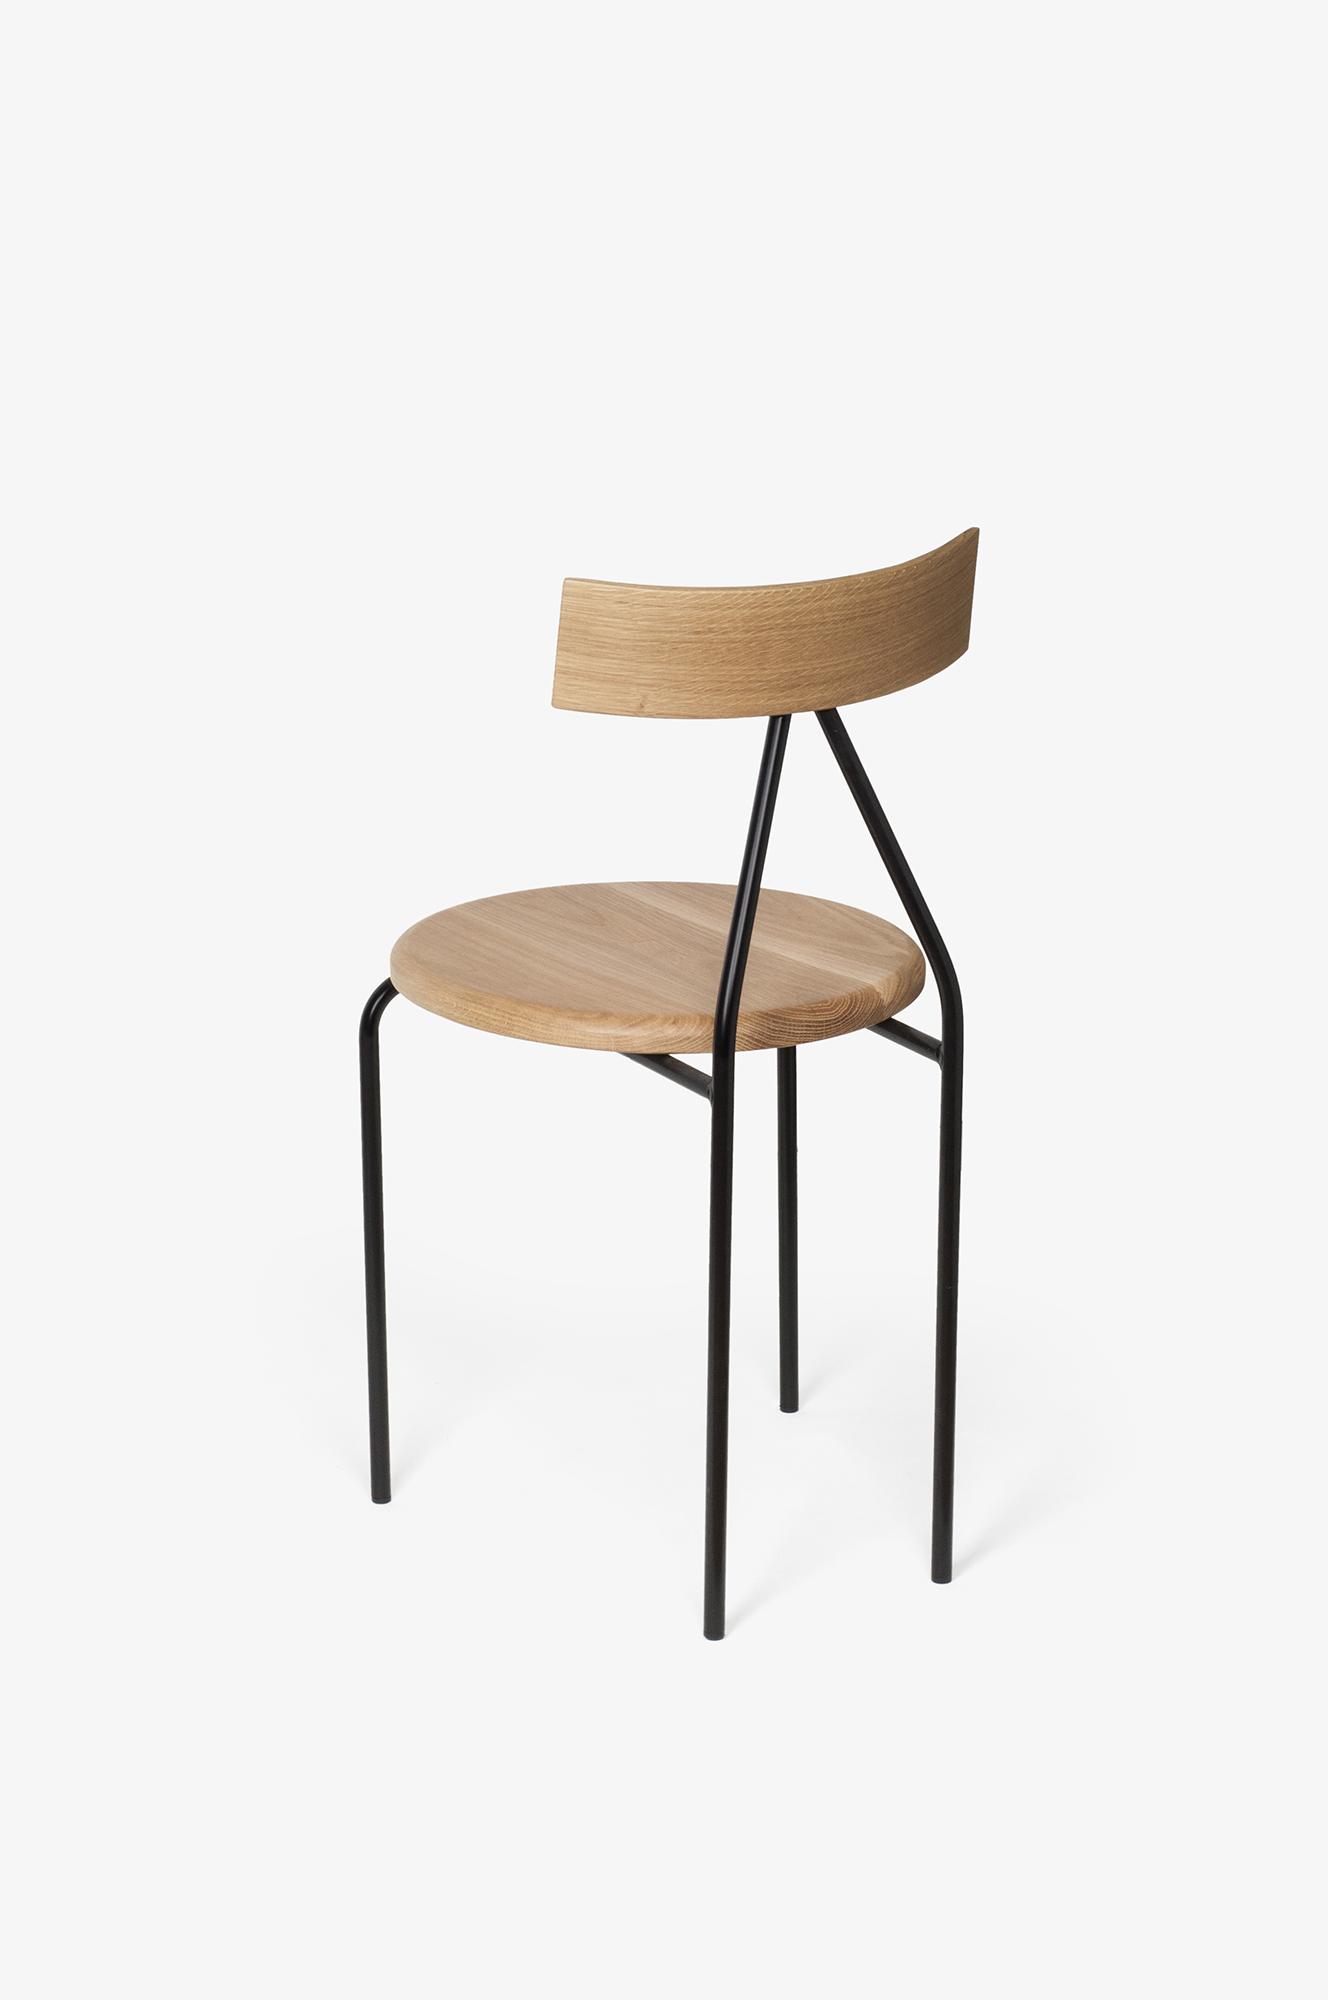 Minimalist Furniture: Gofi Chair by Goula / Figuera Studio